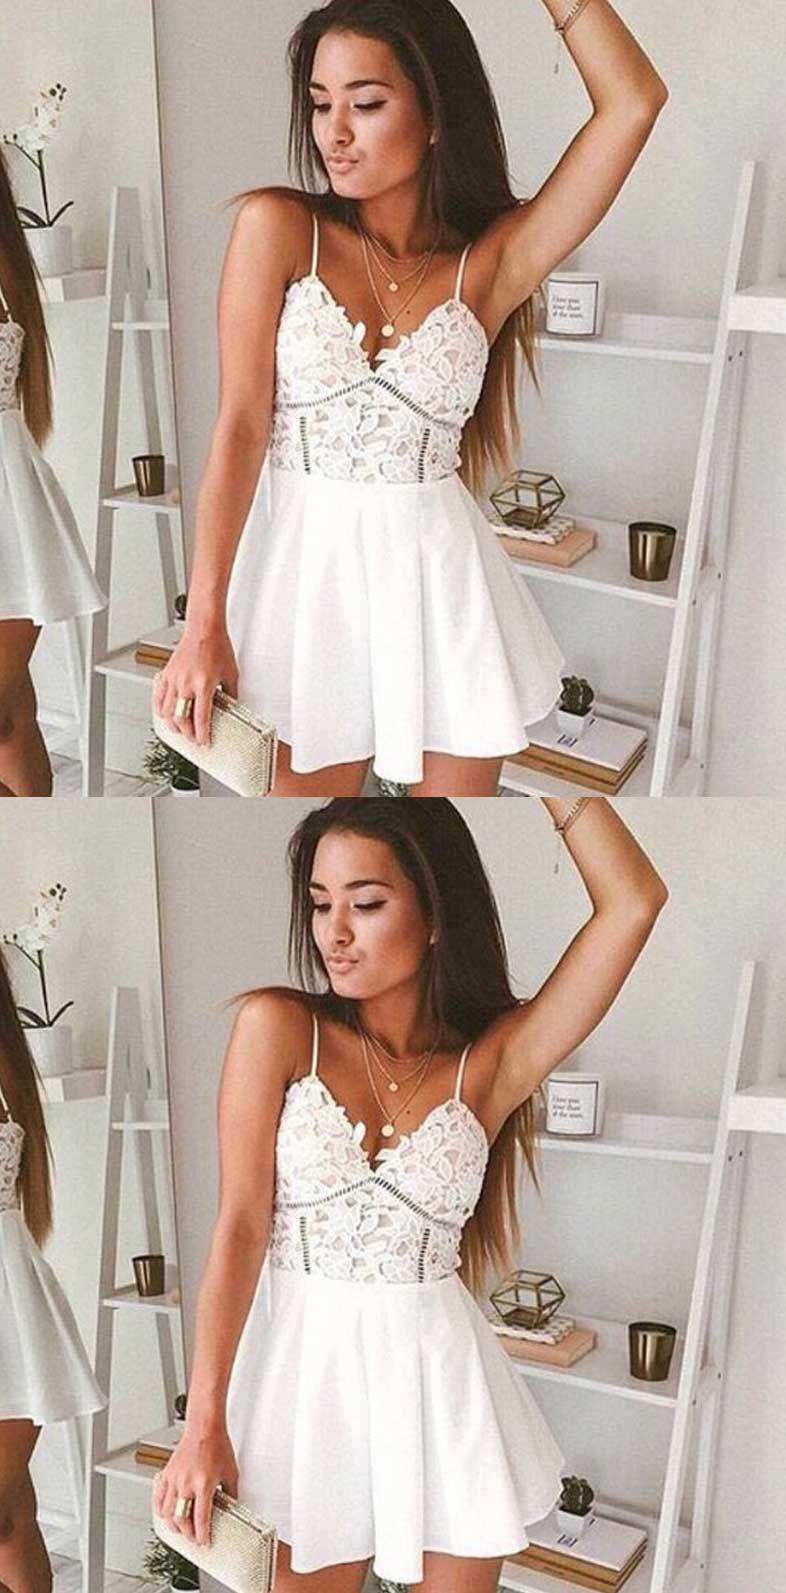 White Lace Homecoming Dress Short Prom Dress V Neck Homecoming Dress Prom Dress With Lace Spagh Mini Homecoming Dresses Cute Prom Dresses Prom Dresses Short [ 1593 x 786 Pixel ]